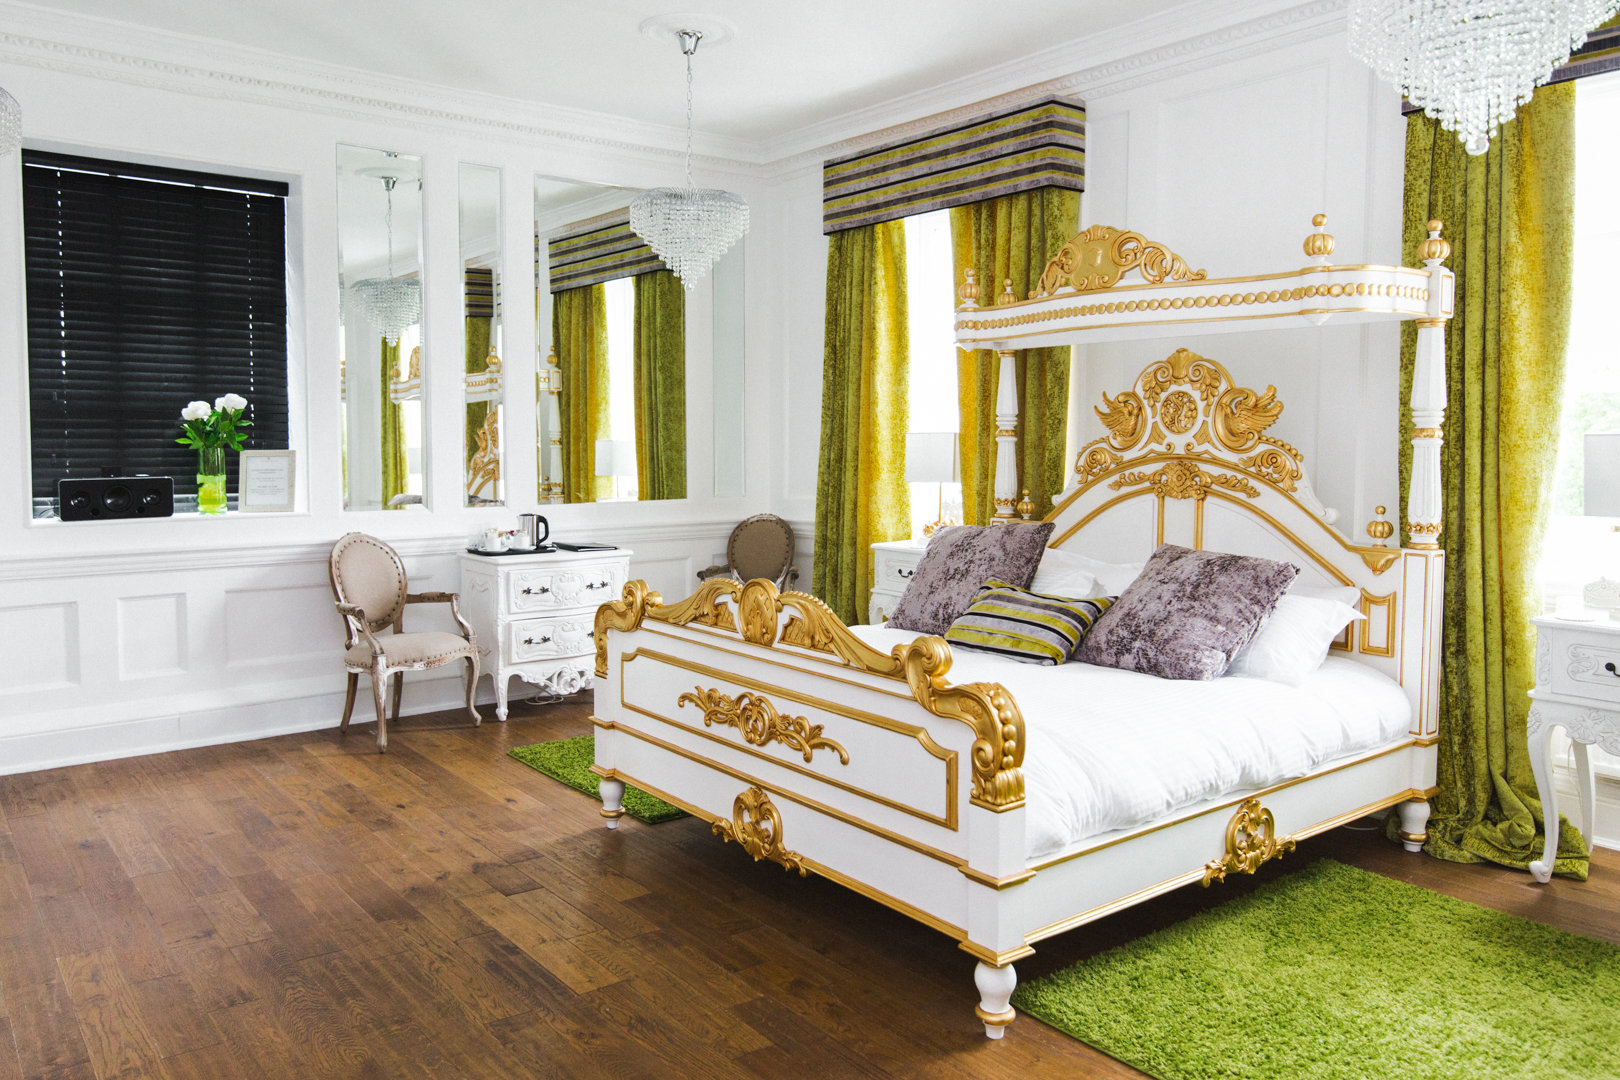 boreham house rooms